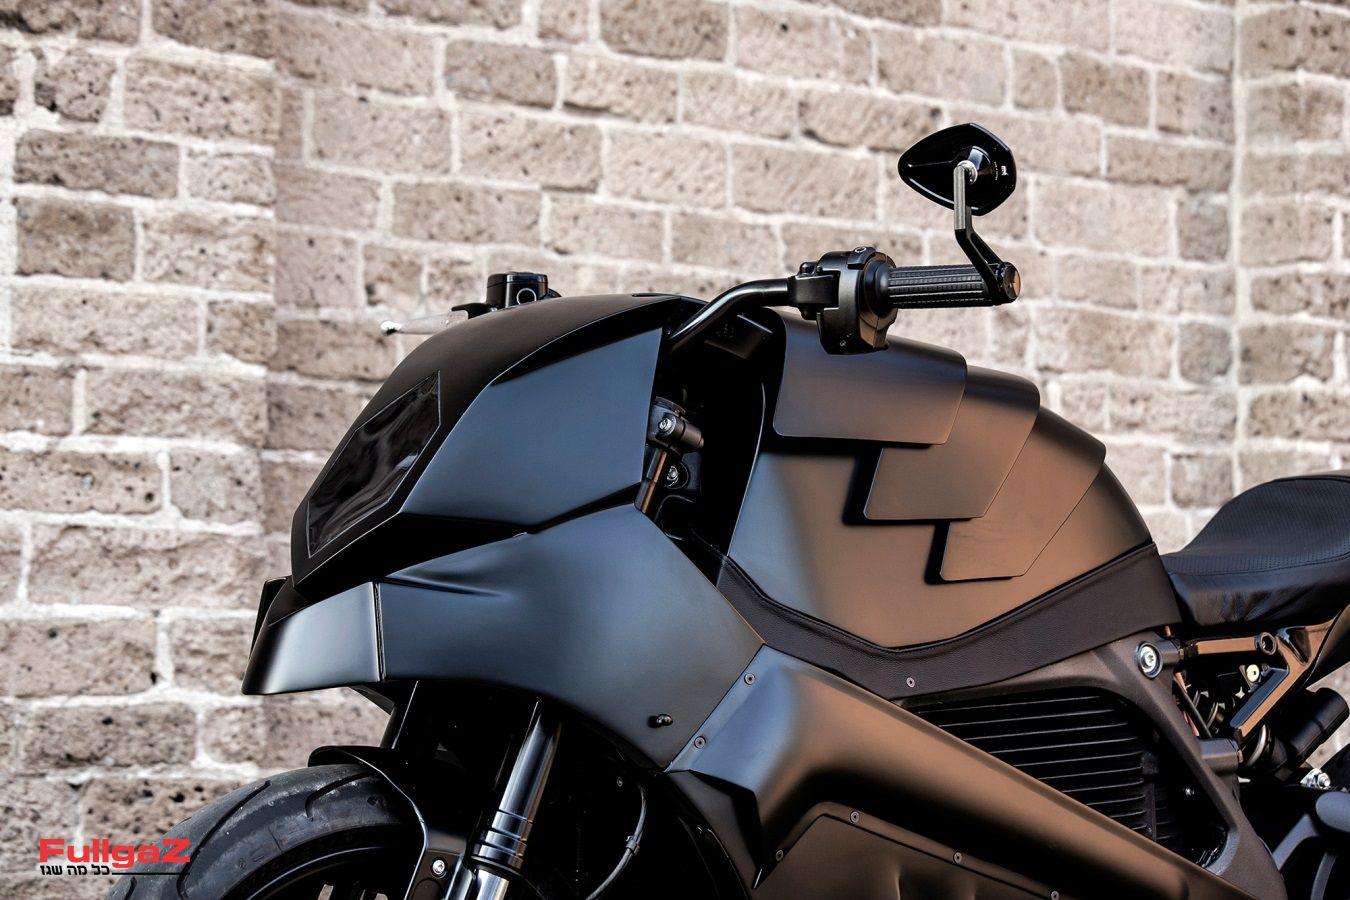 Moto-Adonis-harley-davidson-livewire-custom-3